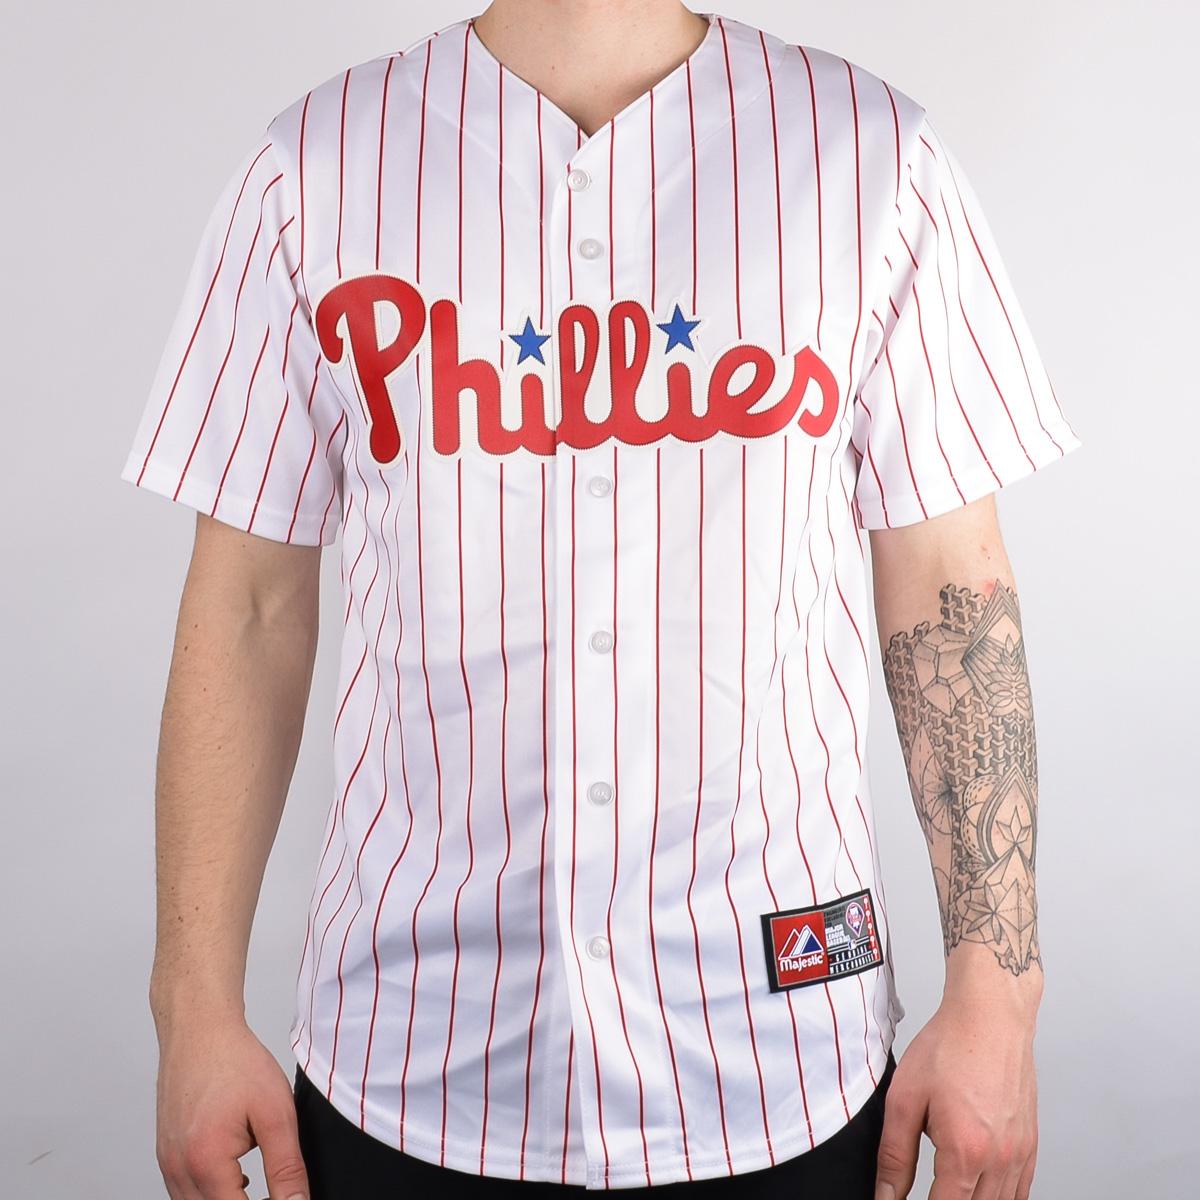 reputable site 9c2cd db9f3 lt Philadelphia Jersey Phillies - Replica Merchandise ...